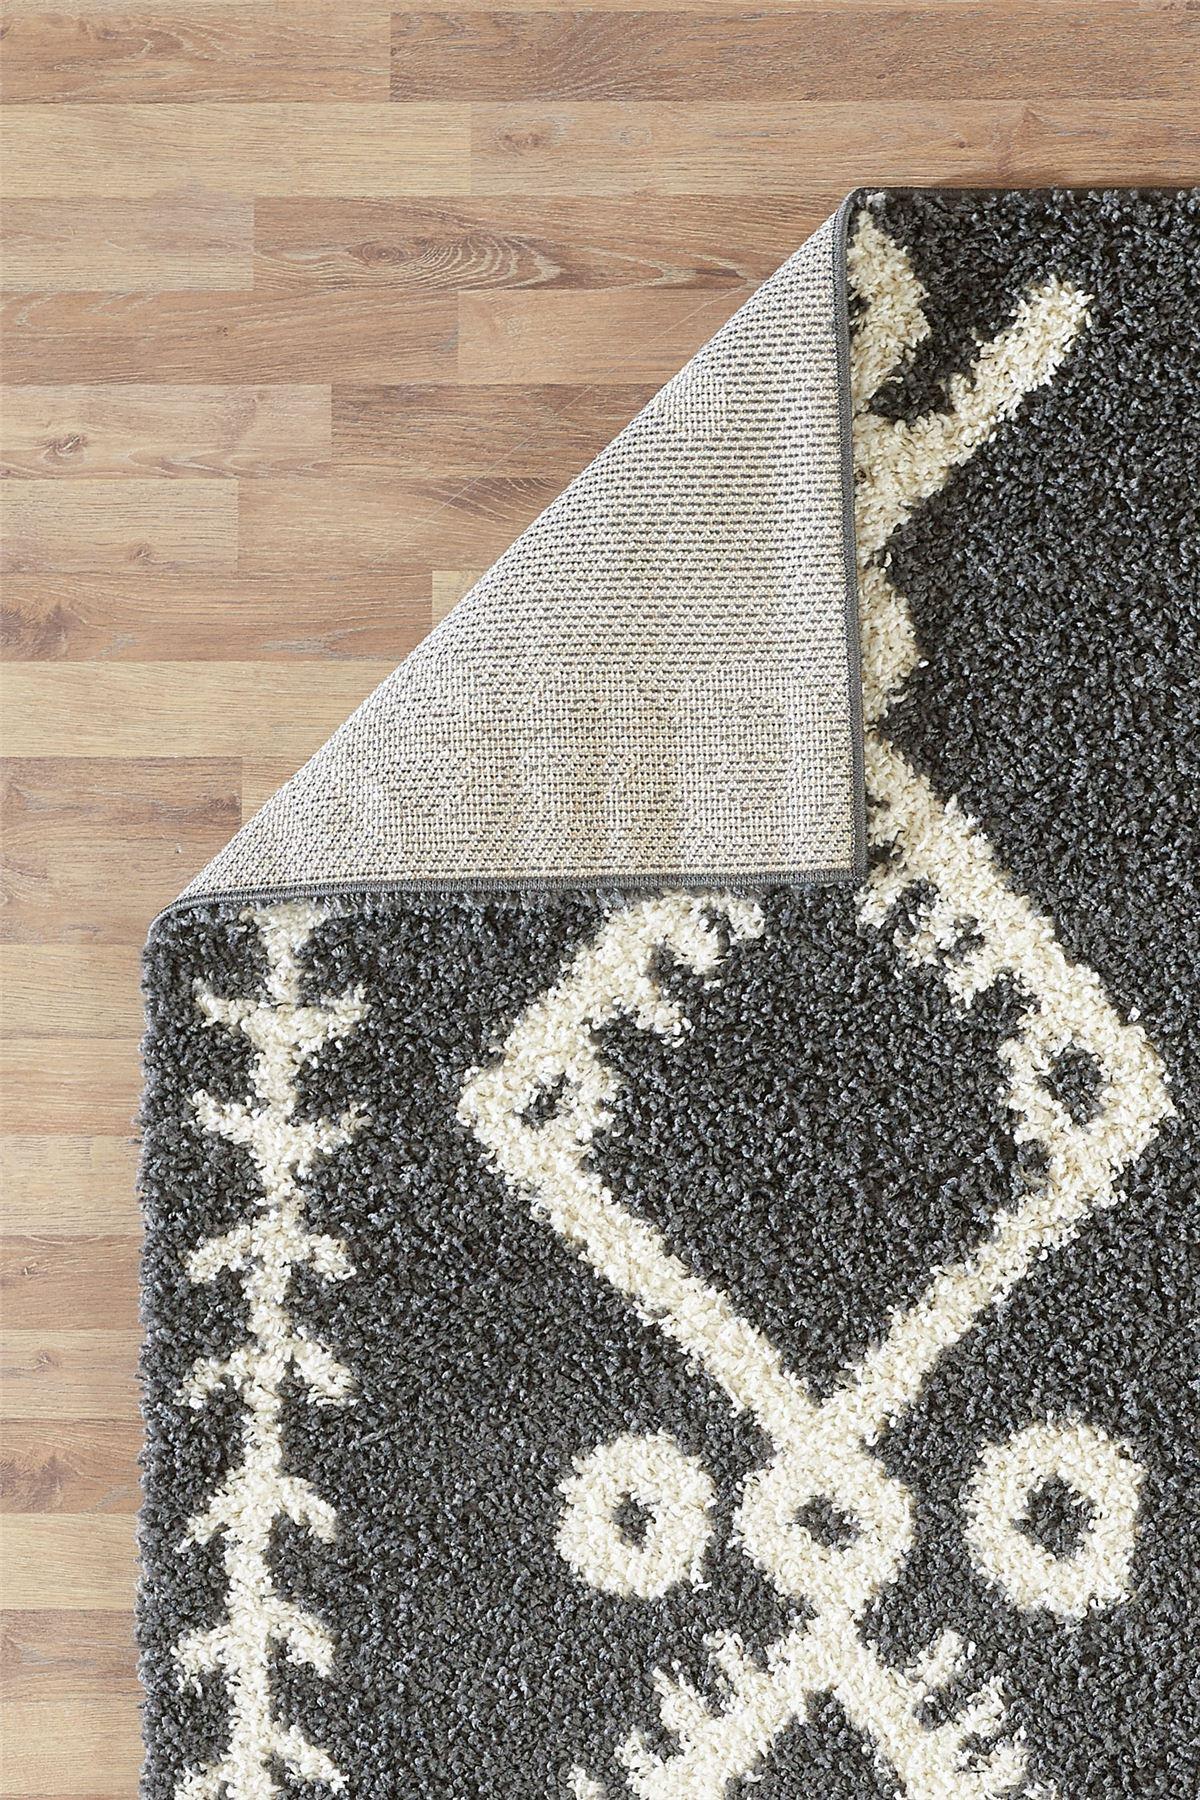 Moroccan-Shaggy-Area-Rug-Grey-White-Black-Soft-Carpet-Traditional-Berber-Designs thumbnail 14